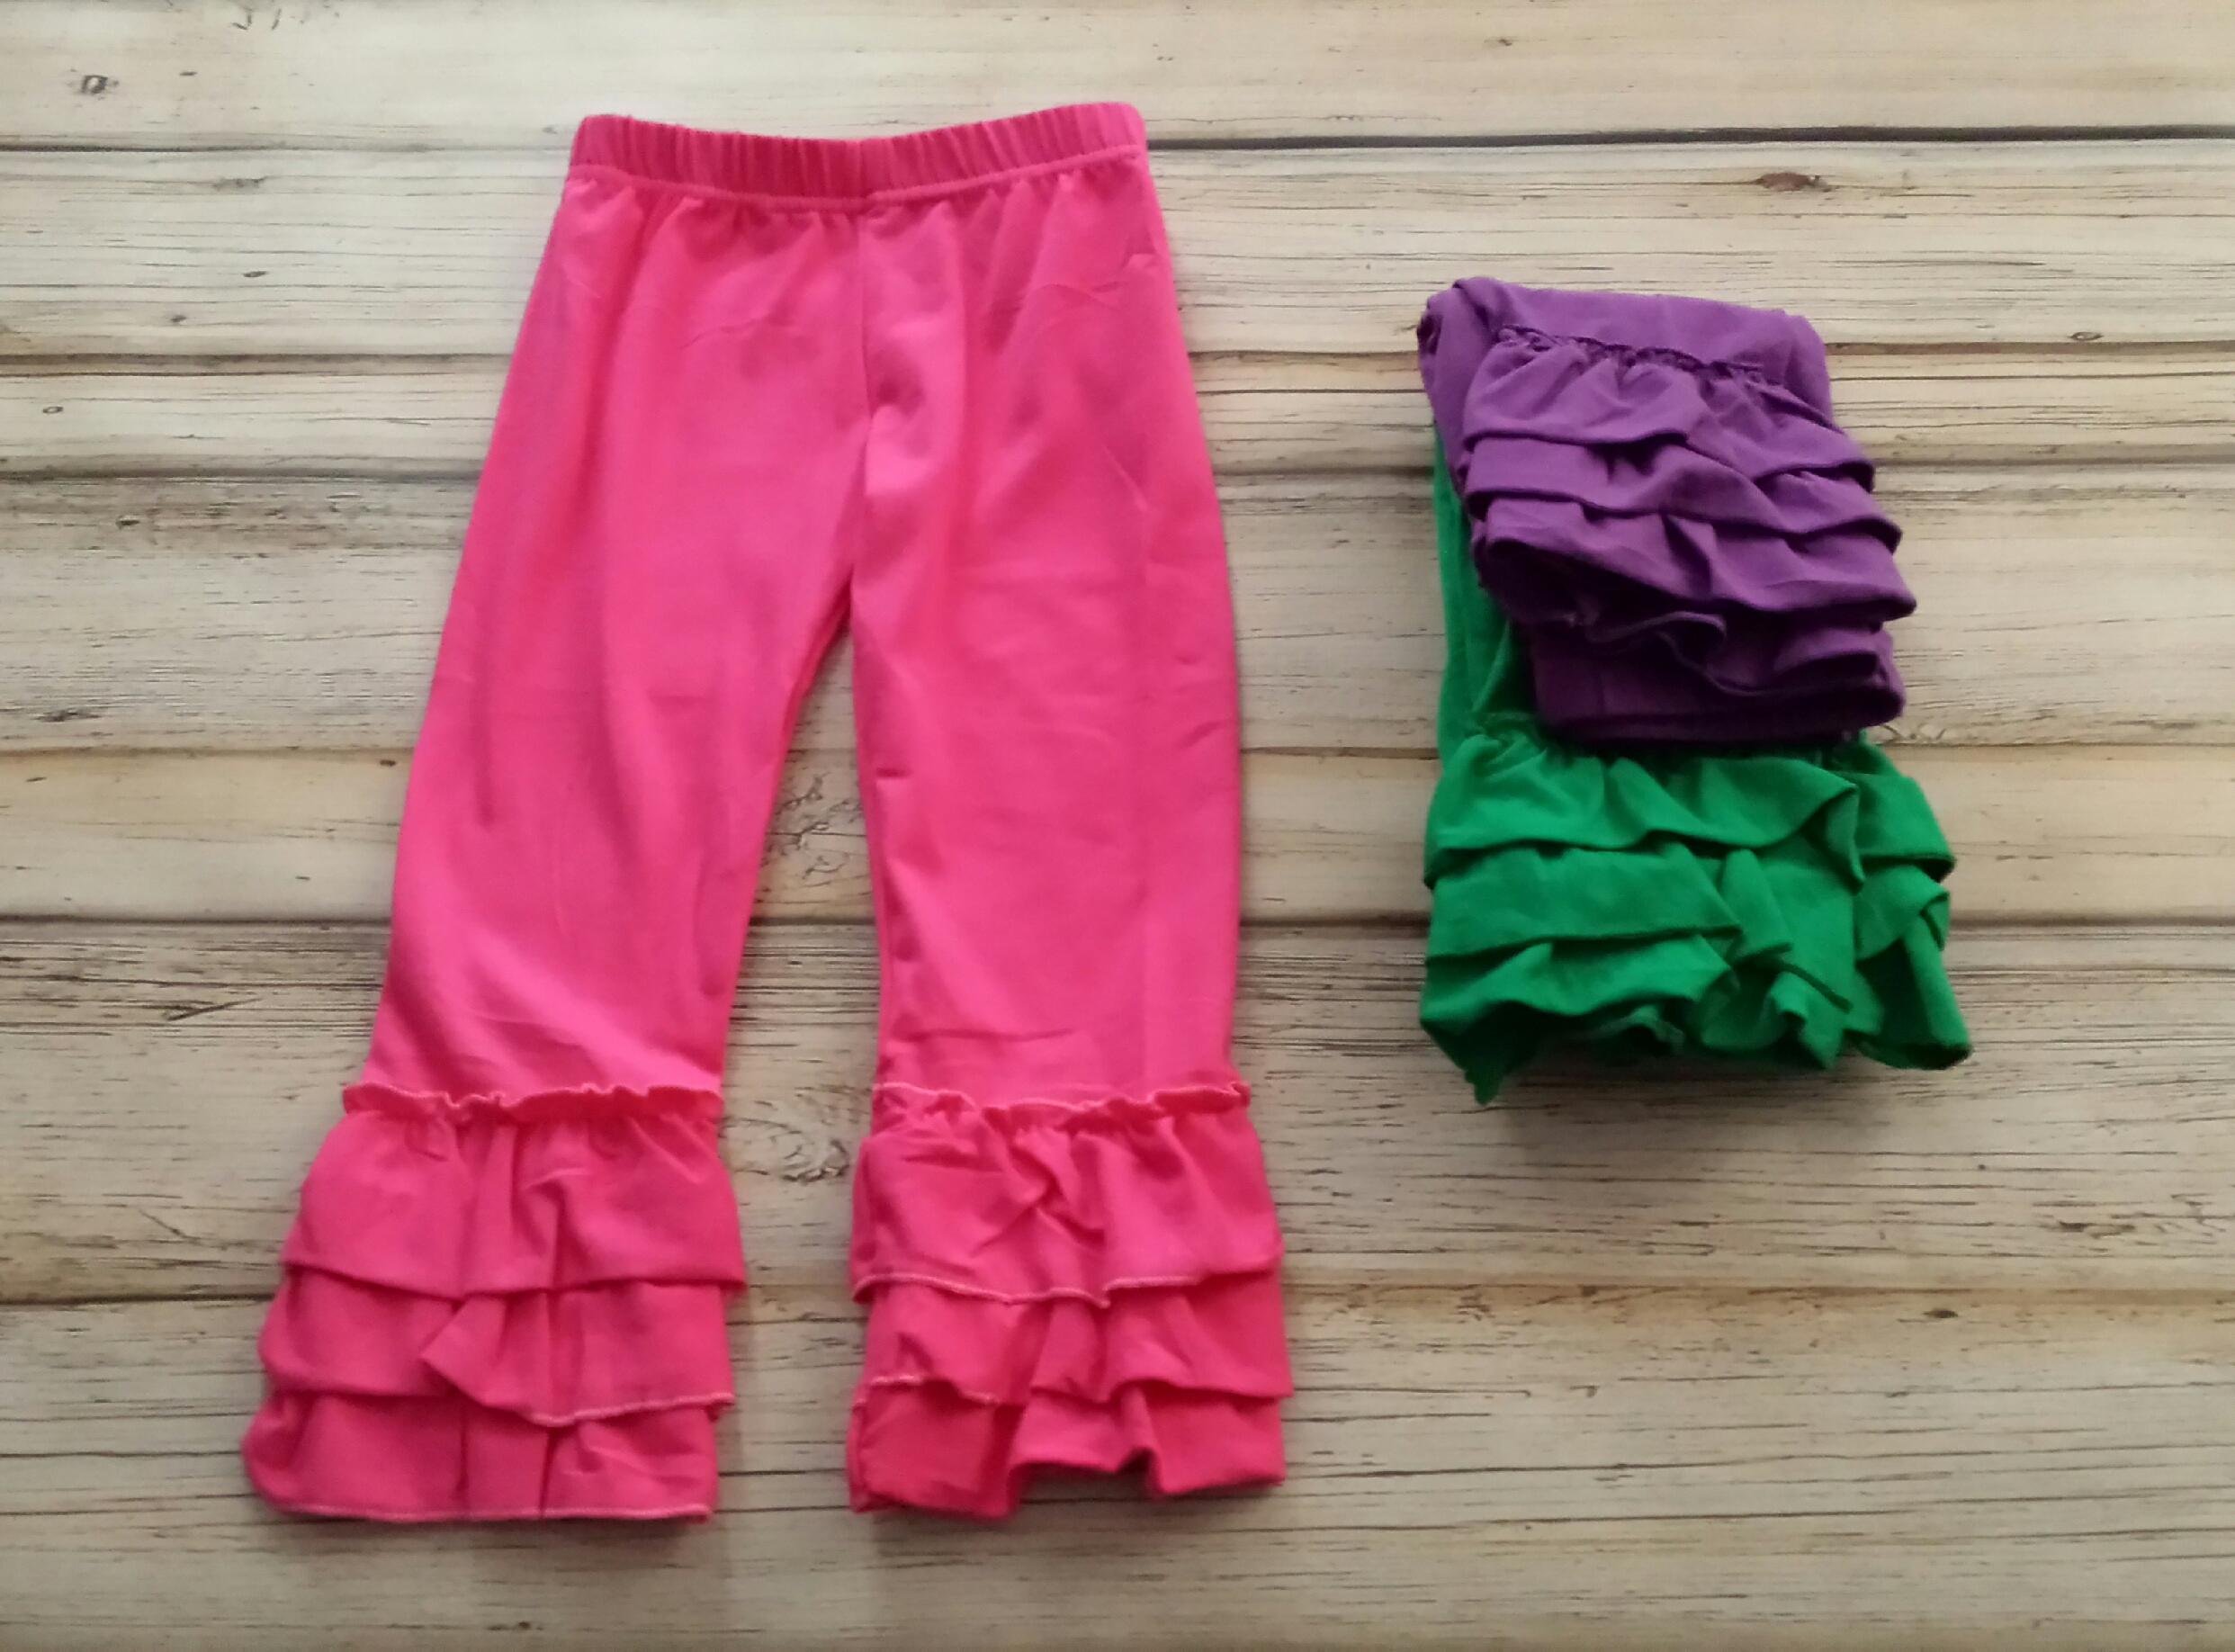 0748bc8451eef6 Triple Ruffle Pants (Round 2) on Storenvy